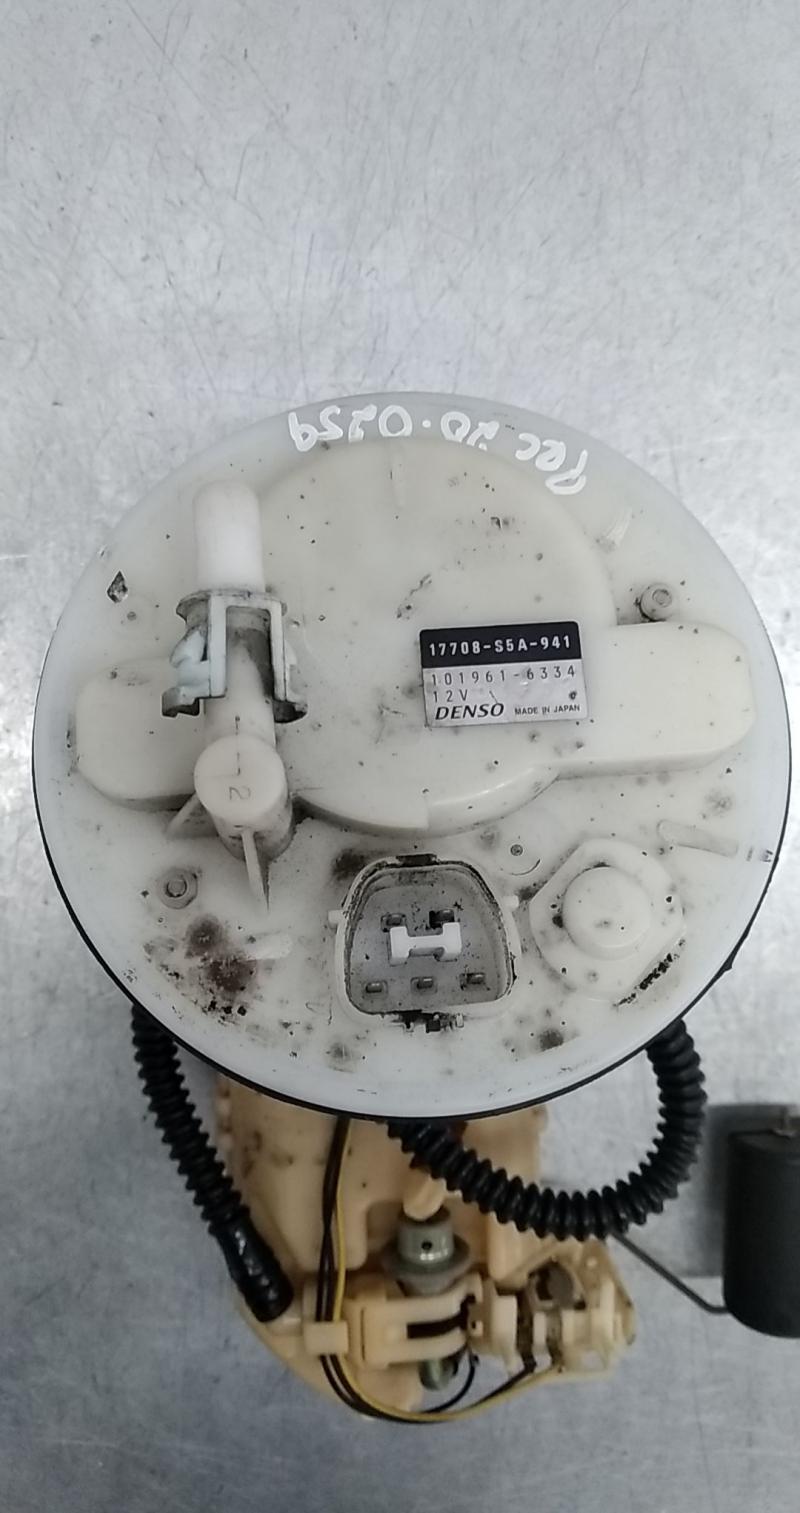 Bomba do Depósito de Combustível (20363223).